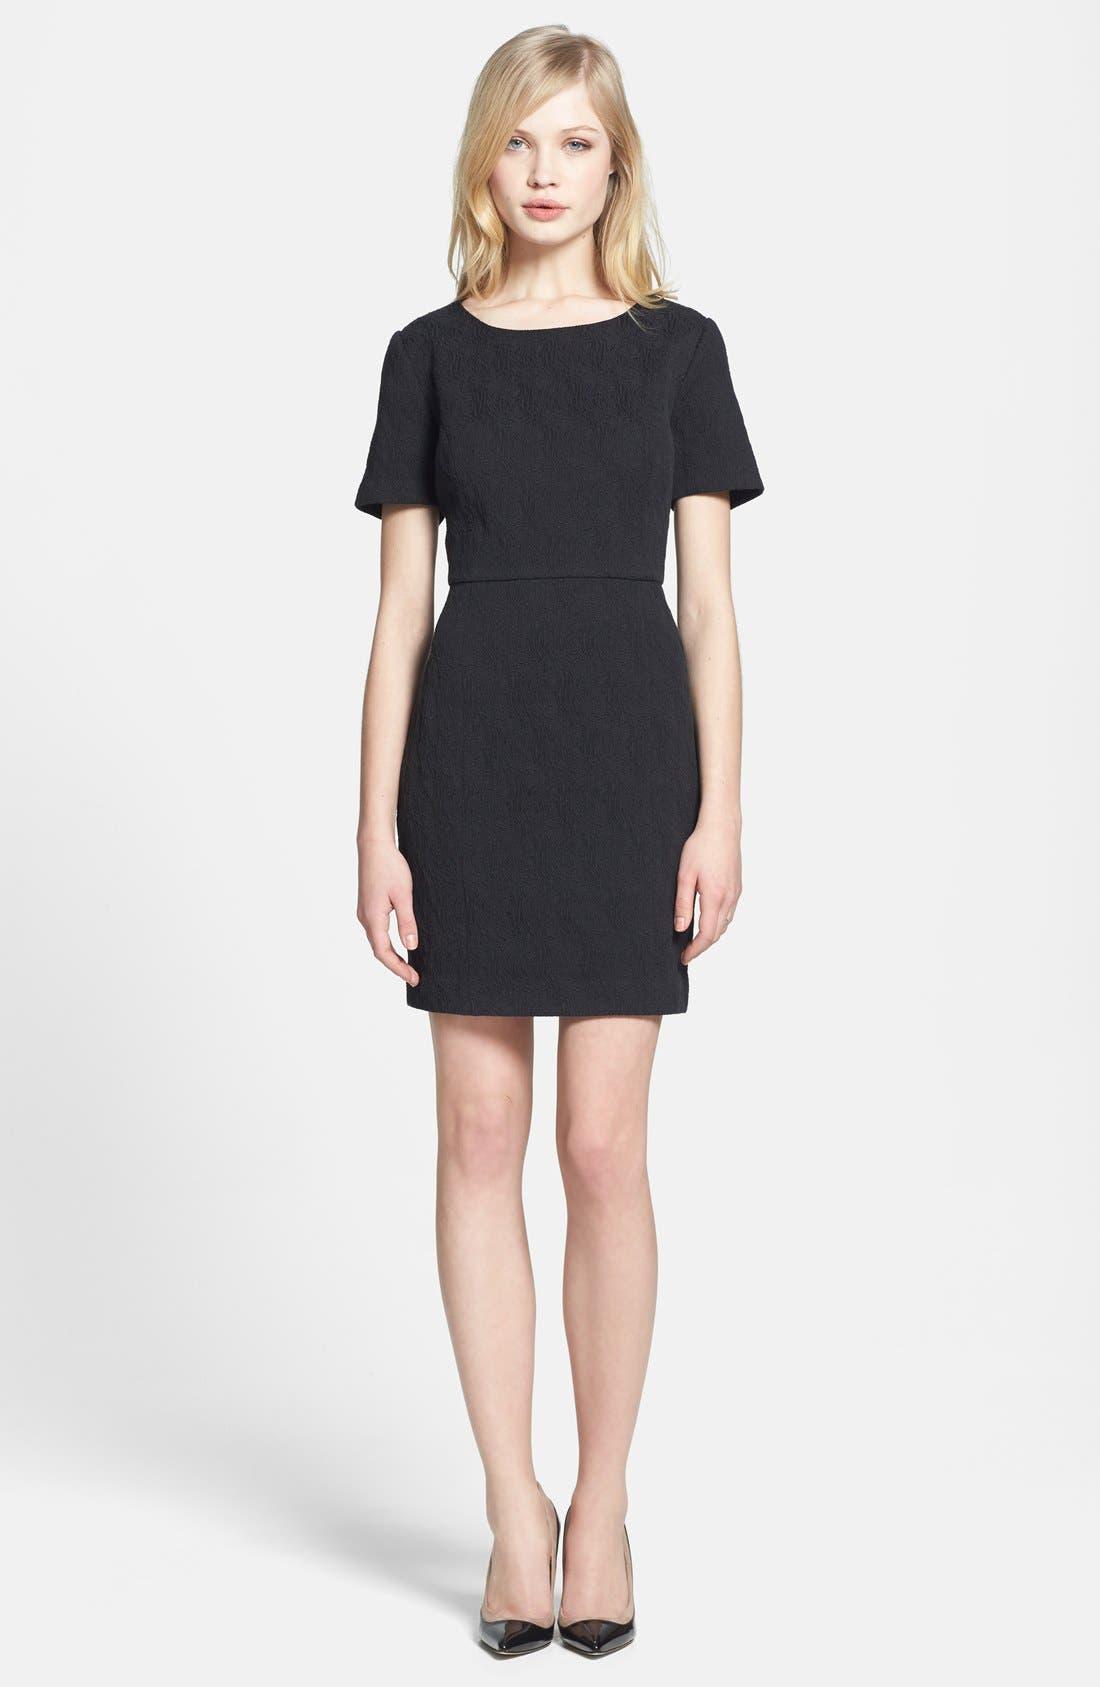 Alternate Image 1 Selected - Chelsea28 Back Cutout Jacquard Dress